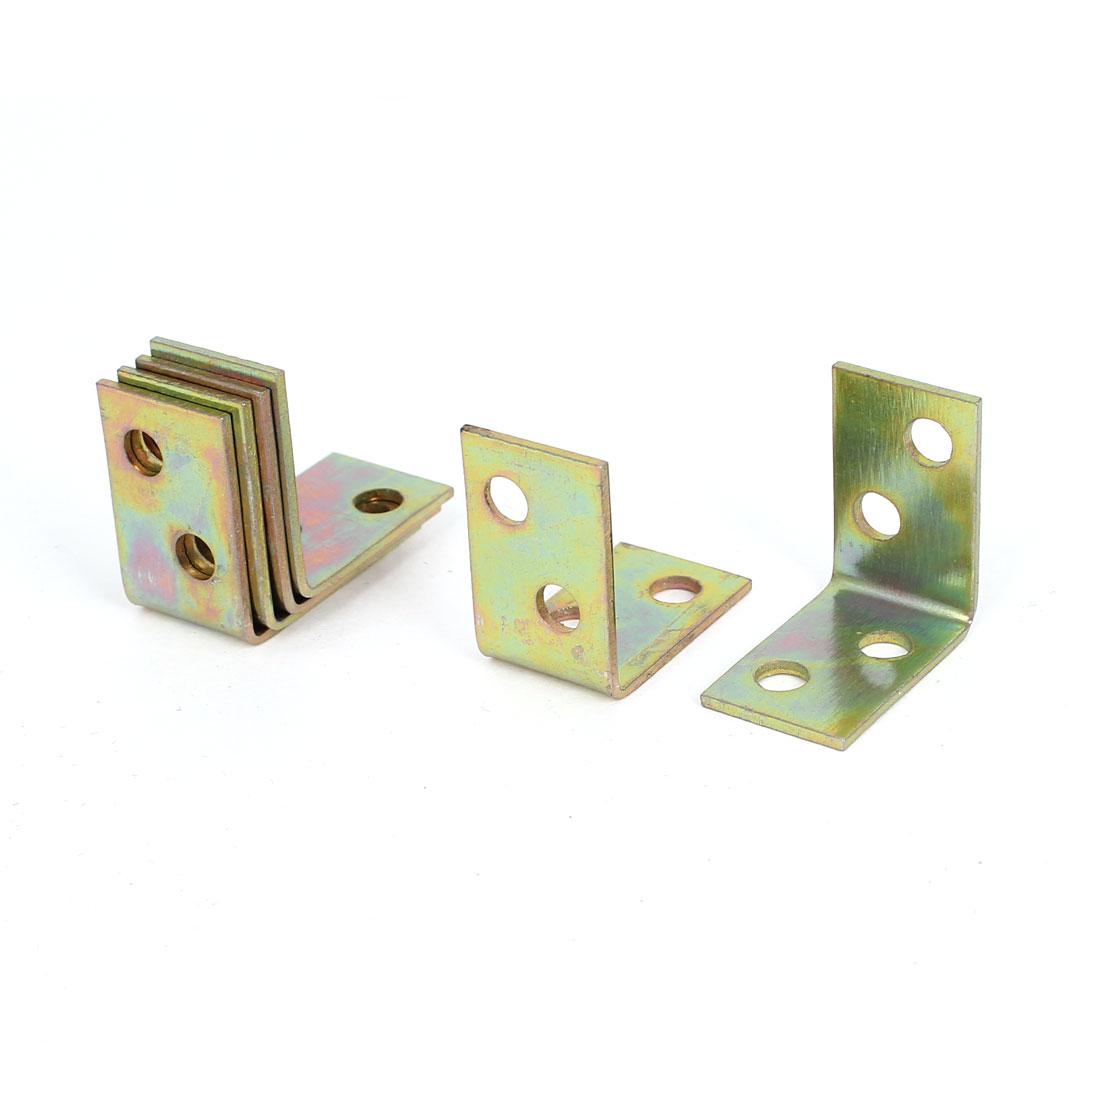 Timber Decking Joists Metal L Shaped 90 Degree Angle Brackets 26x26x16mm 6 Pcs